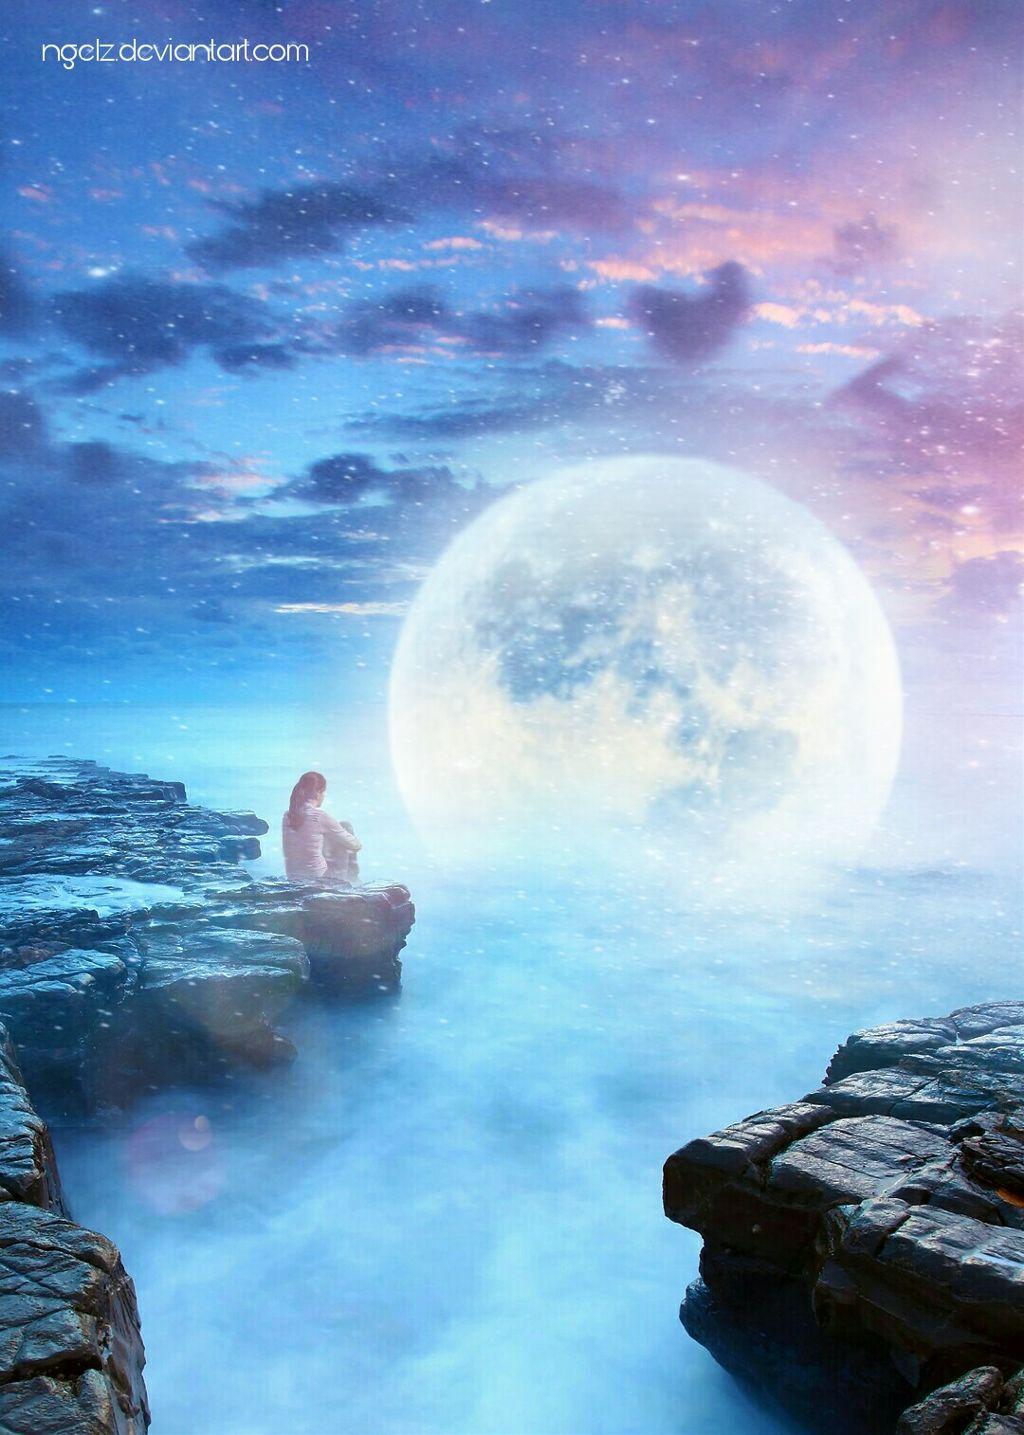 Talking to the moon #surreal #madewithpicsart #deviantart